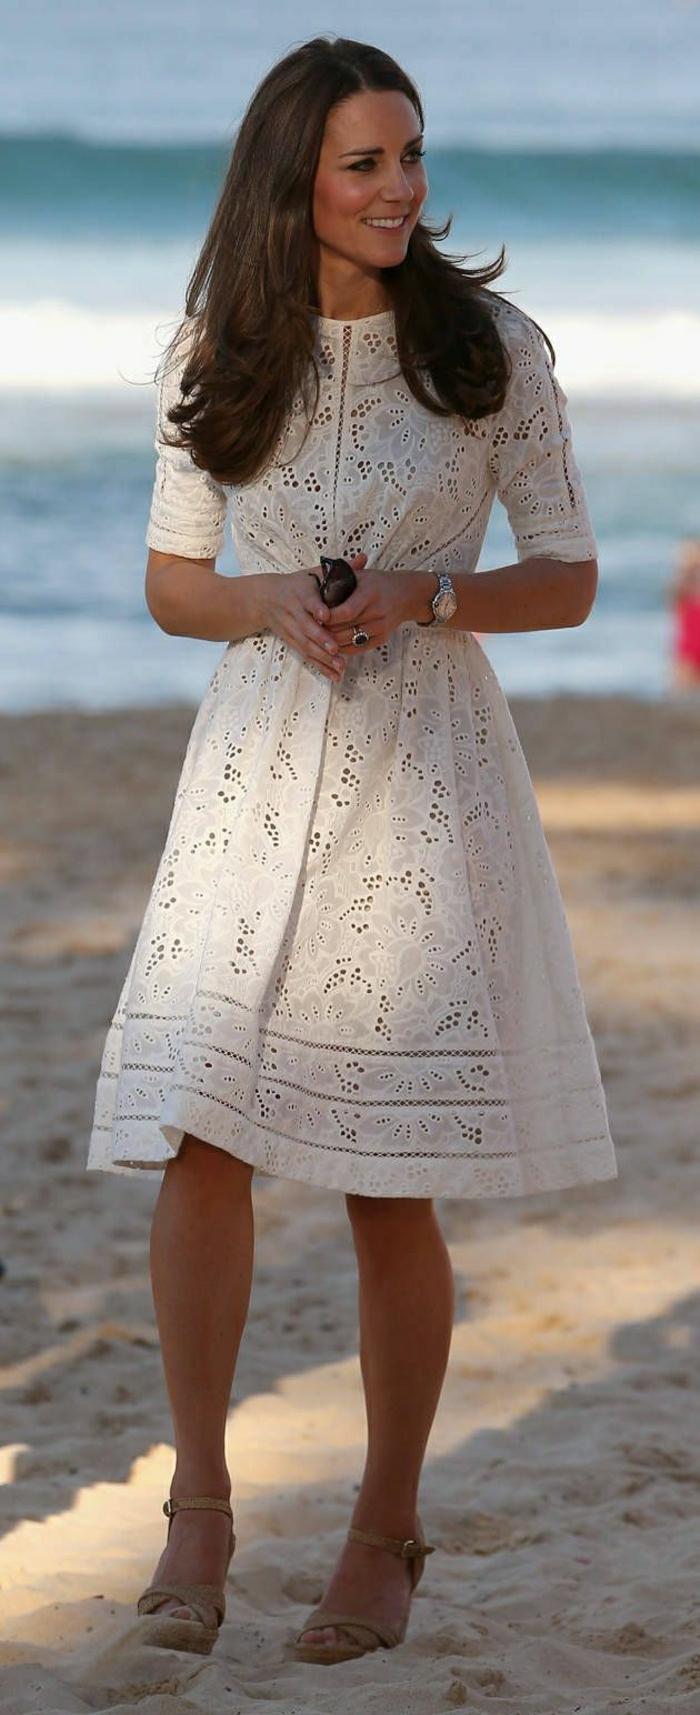 Kate-Middleton-Strand-Spaziergang-weißes-Designer-Sommerkleid